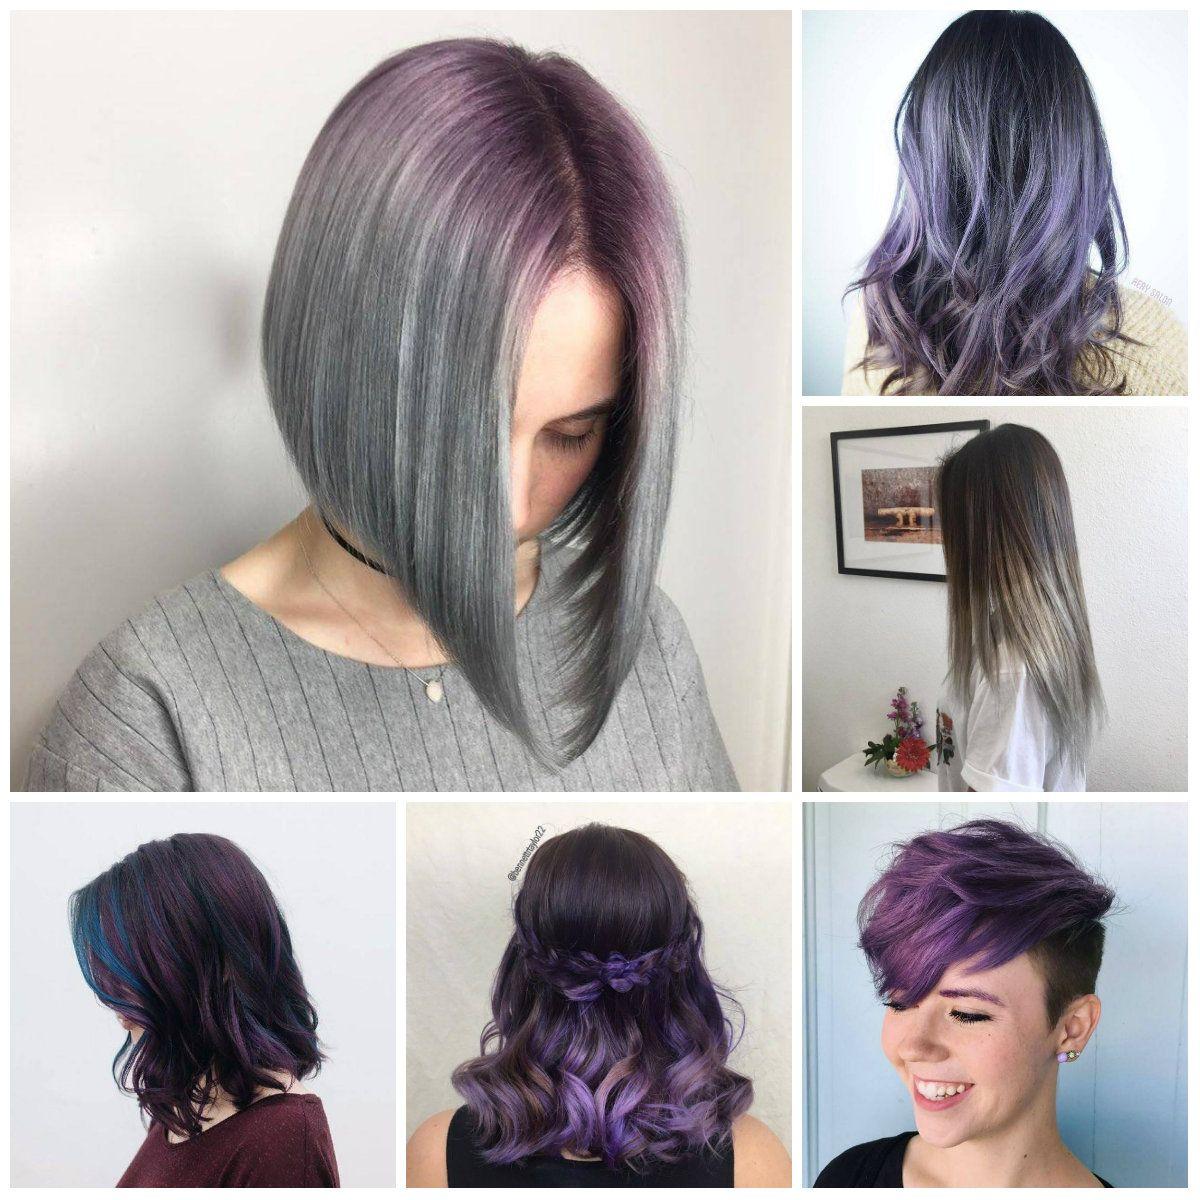 Purple Hair Colors For Short Hair In 2018 Hair Ideas In 2018